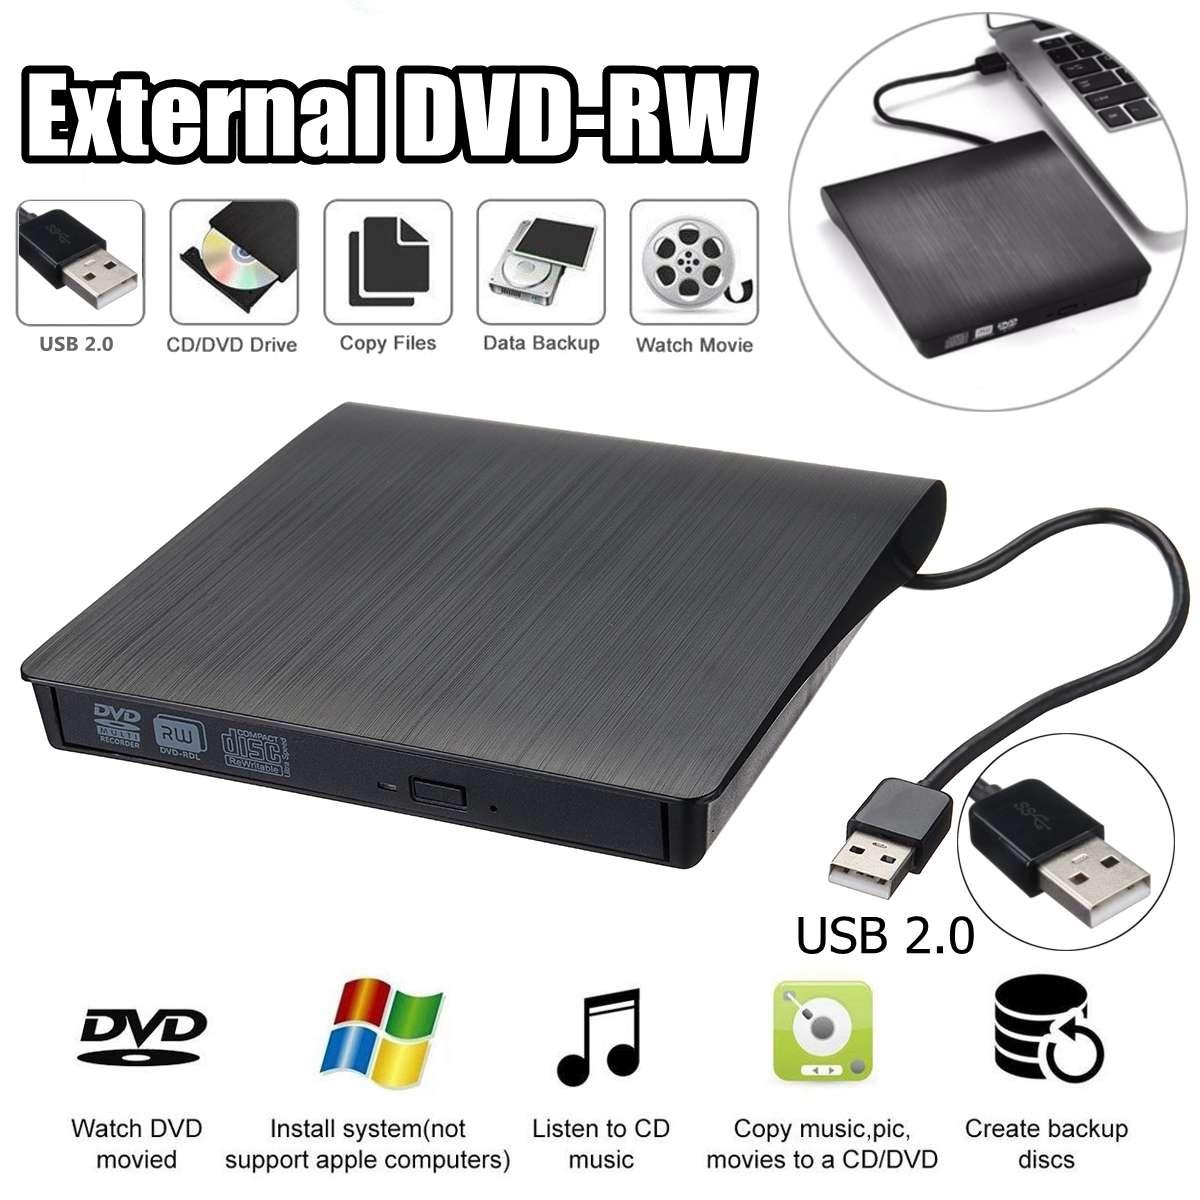 External DVD CD Reader Optical Drive USB 2.0 DVD-RW CD-RW Player Burner Slim Portable Reader Recorder Portatil for Laptop PC